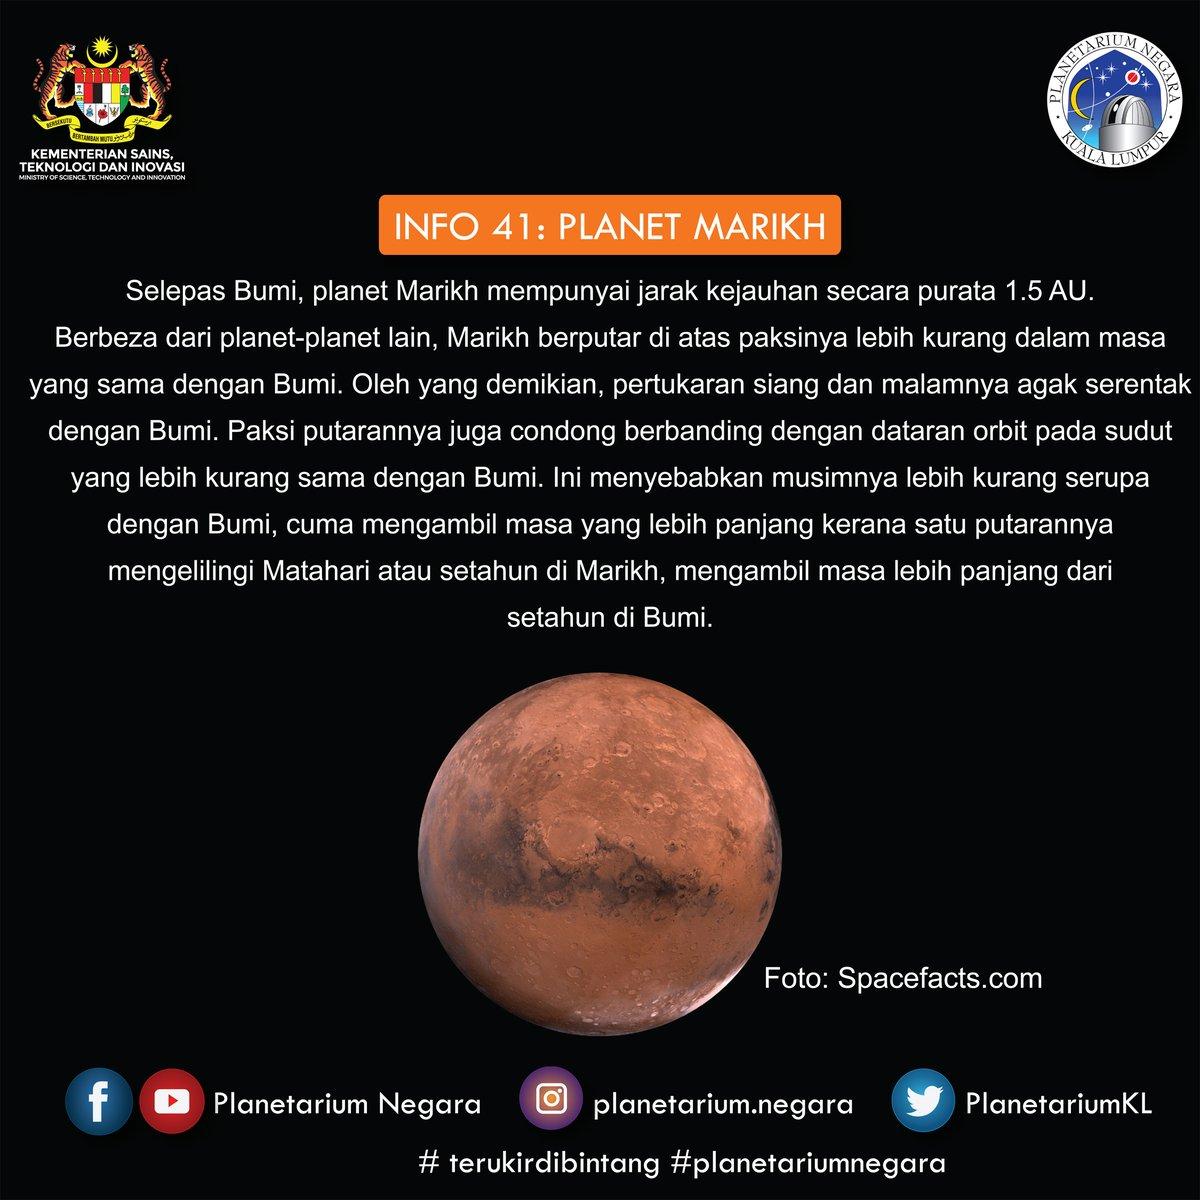 PlanetariumNegara a Twitter